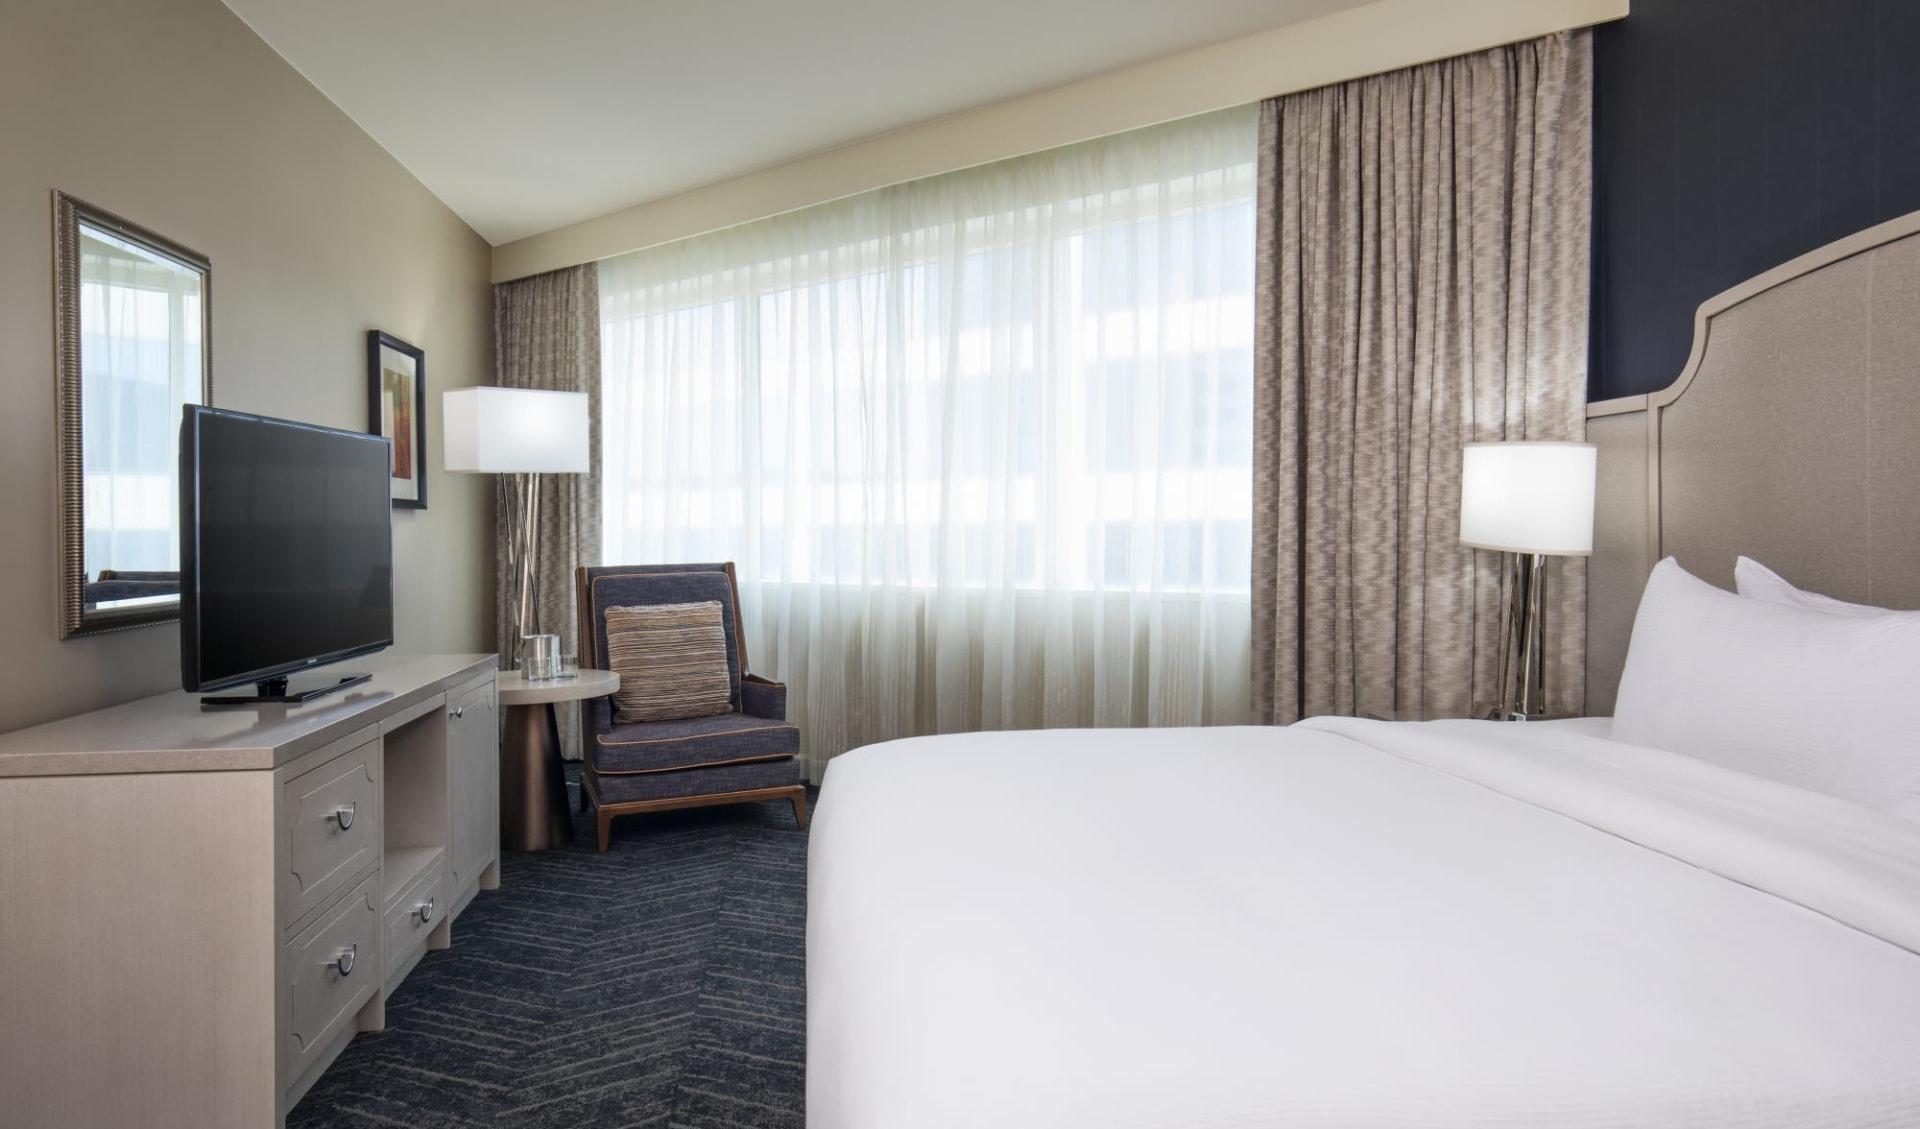 DoubleTree by Hilton Hotel Nashville Downtown:  Doubletree Nashville - King room